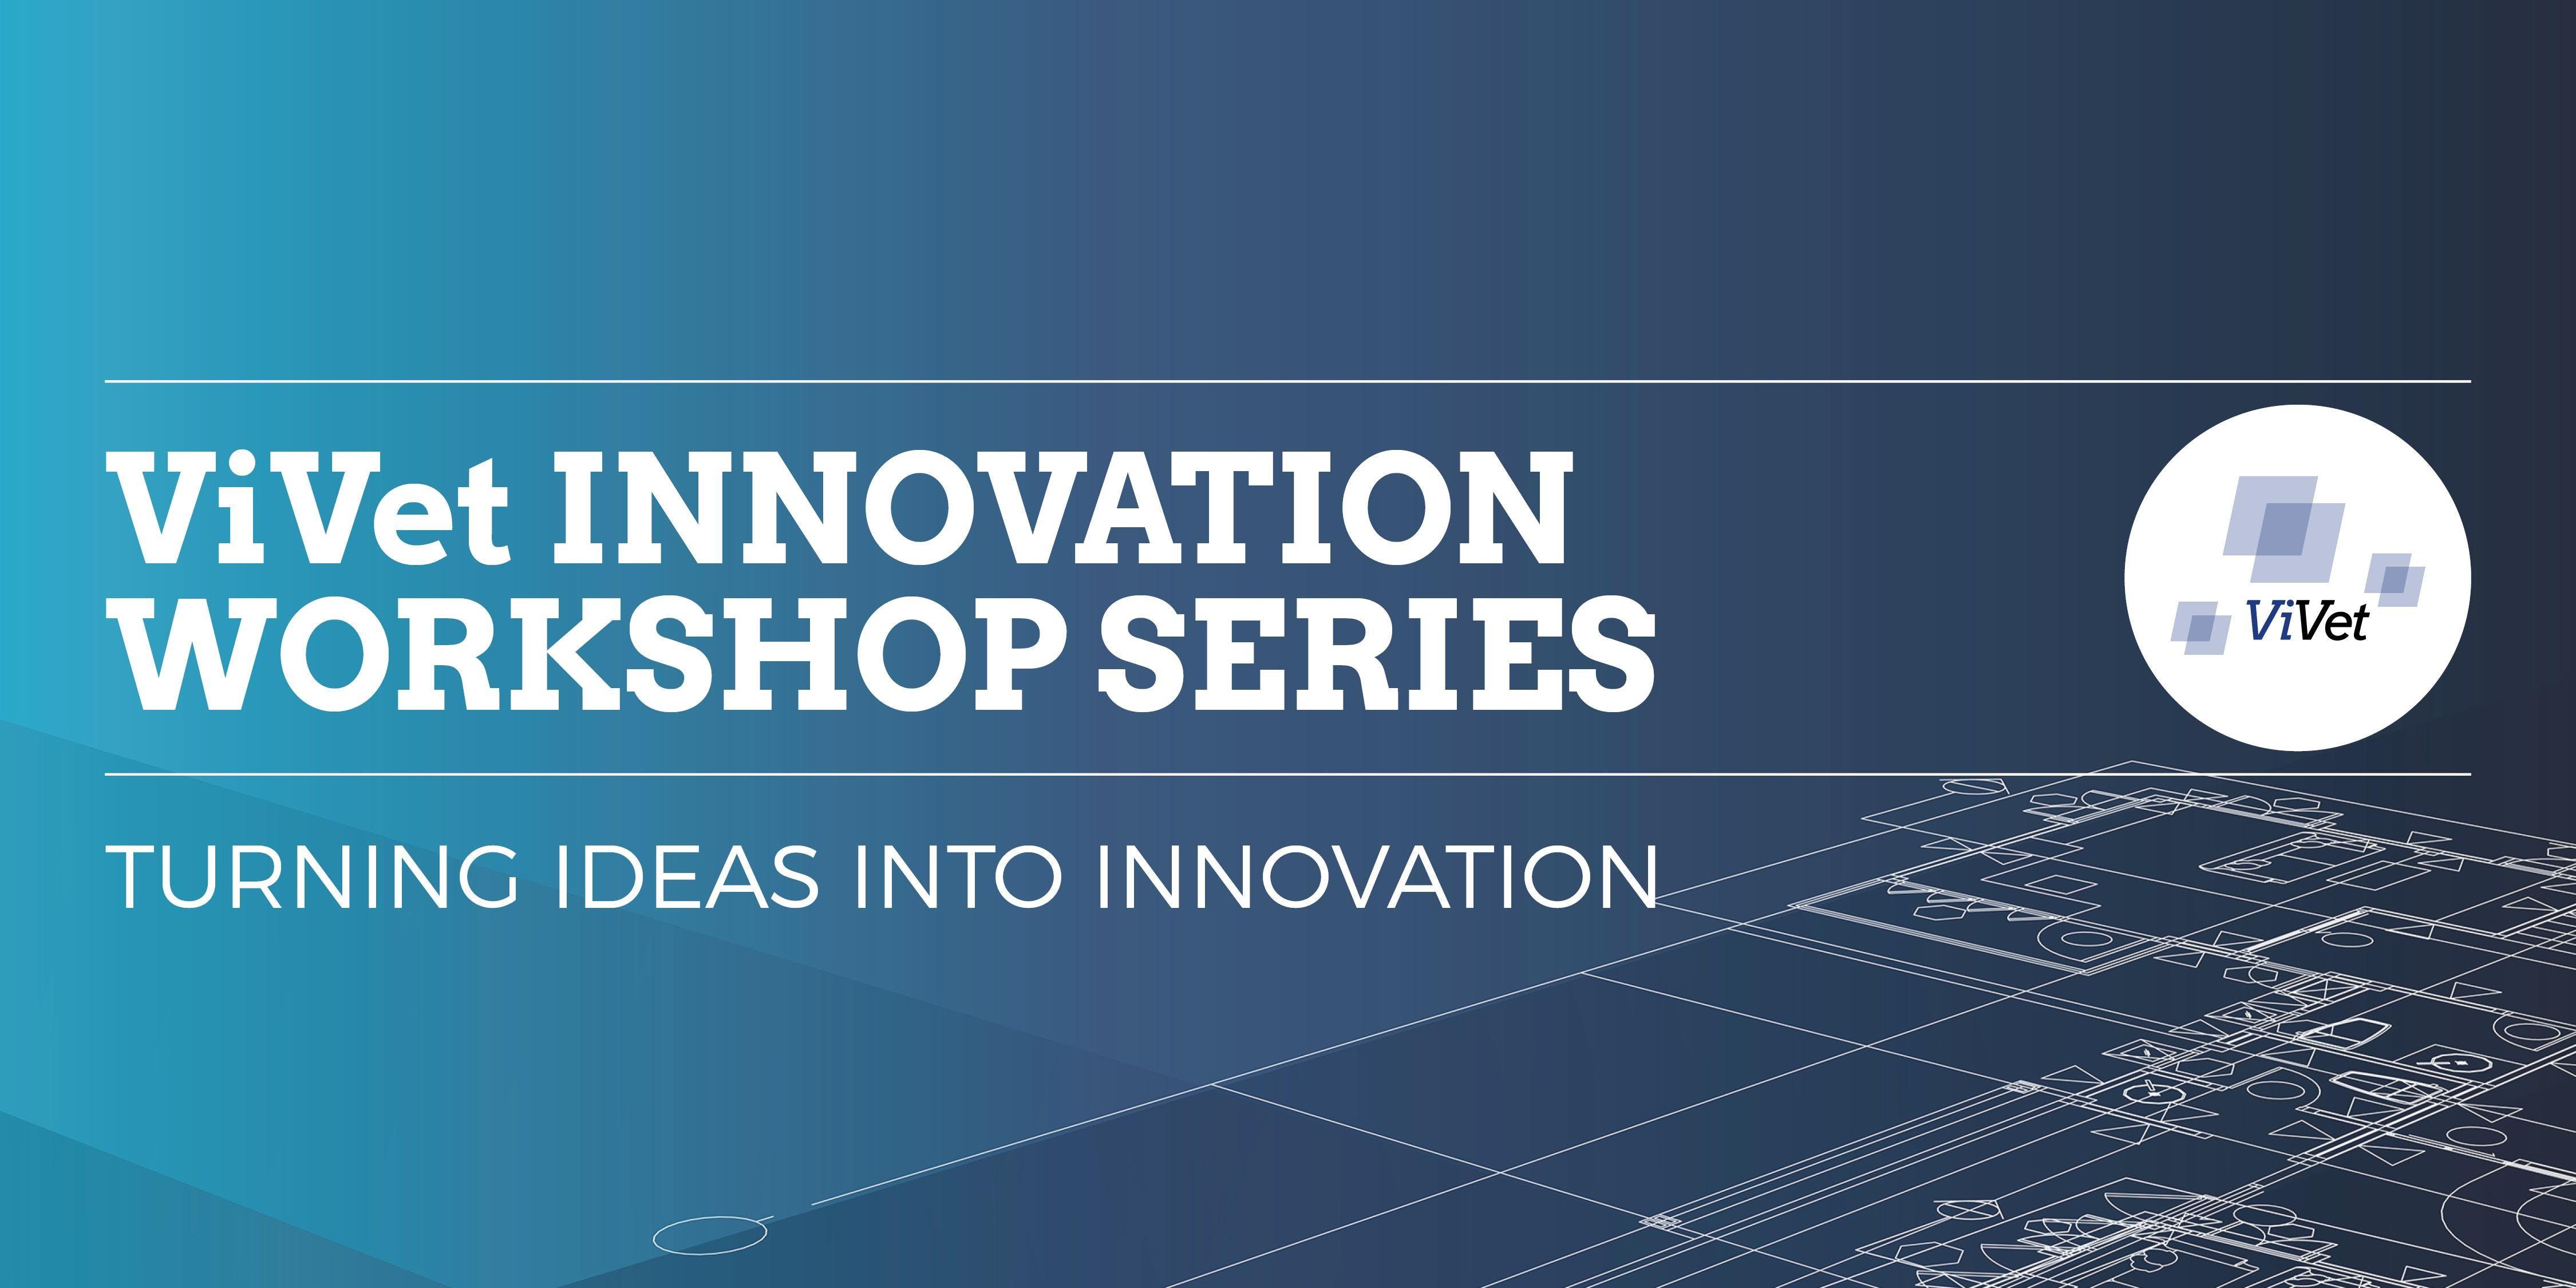 ViVet Innovation workshop series - Part 2, Tu